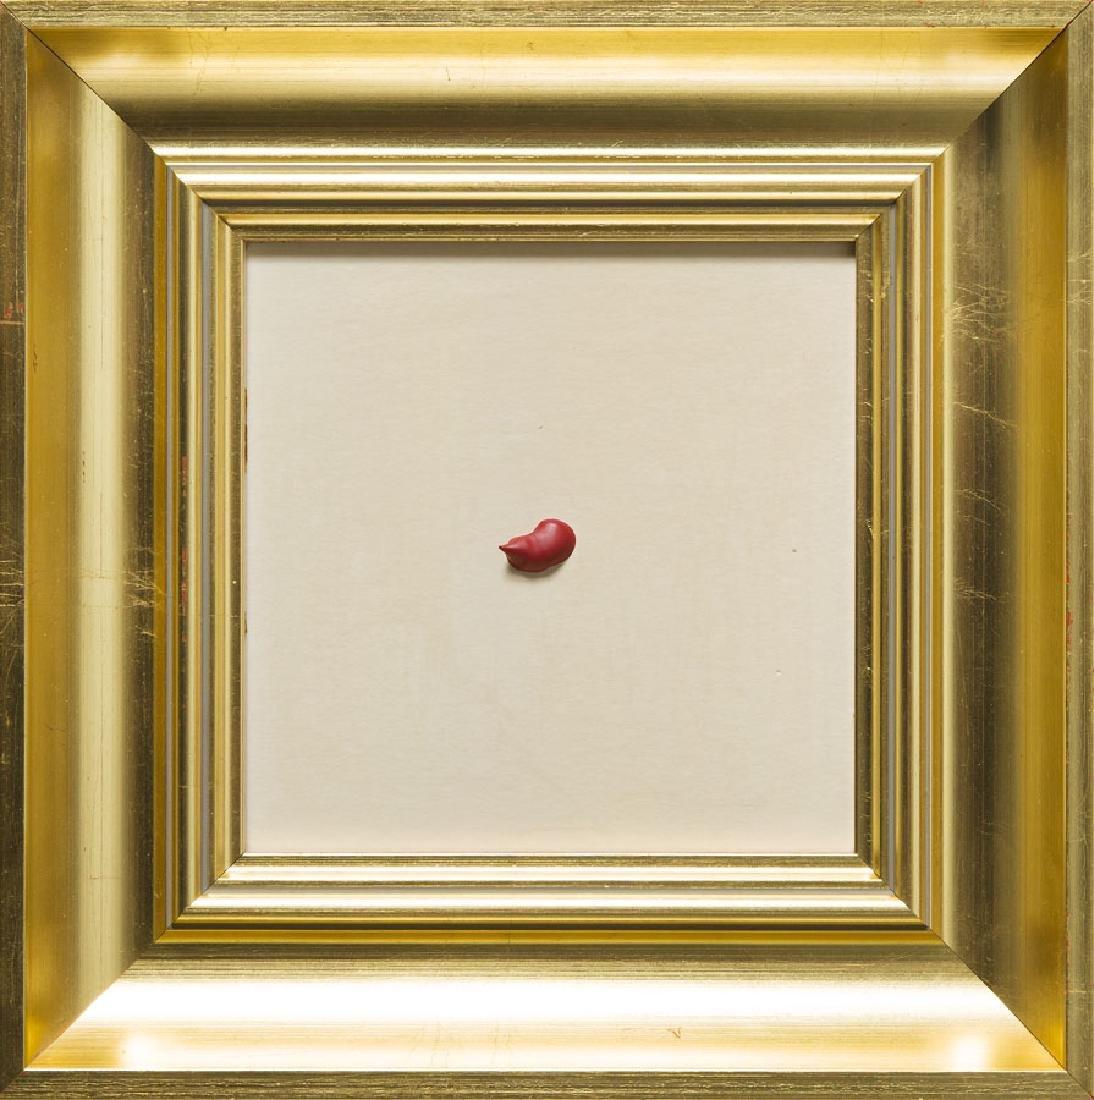 Edward Krasinski (1925 - 2004) Drop; oil on paper, 15.2